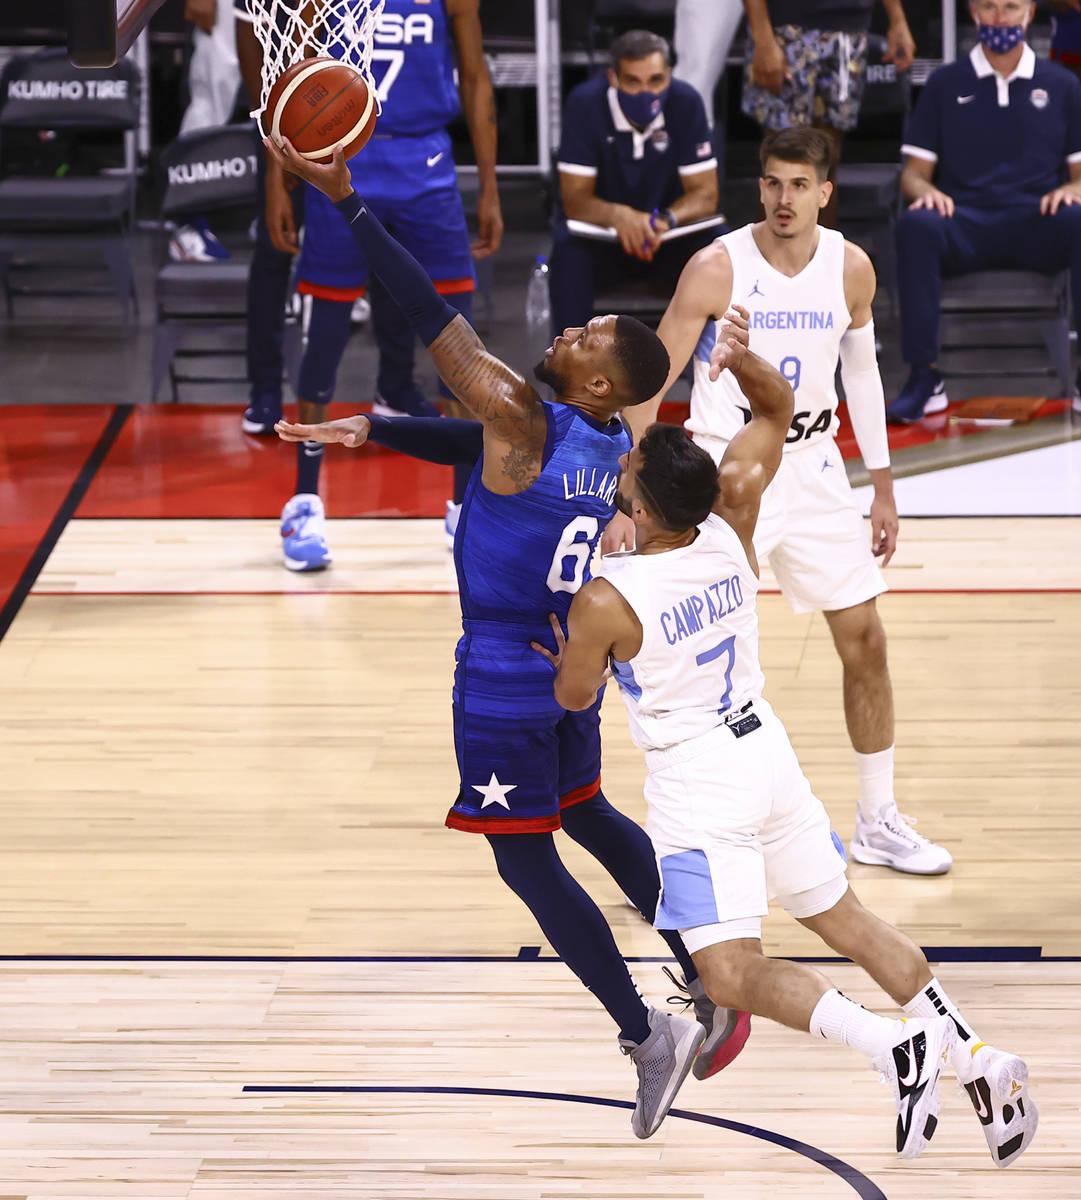 USAÕs Damian Lillard (6) goes to the basket past ArgentinaÕs Facundo Campazzo (7) dur ...